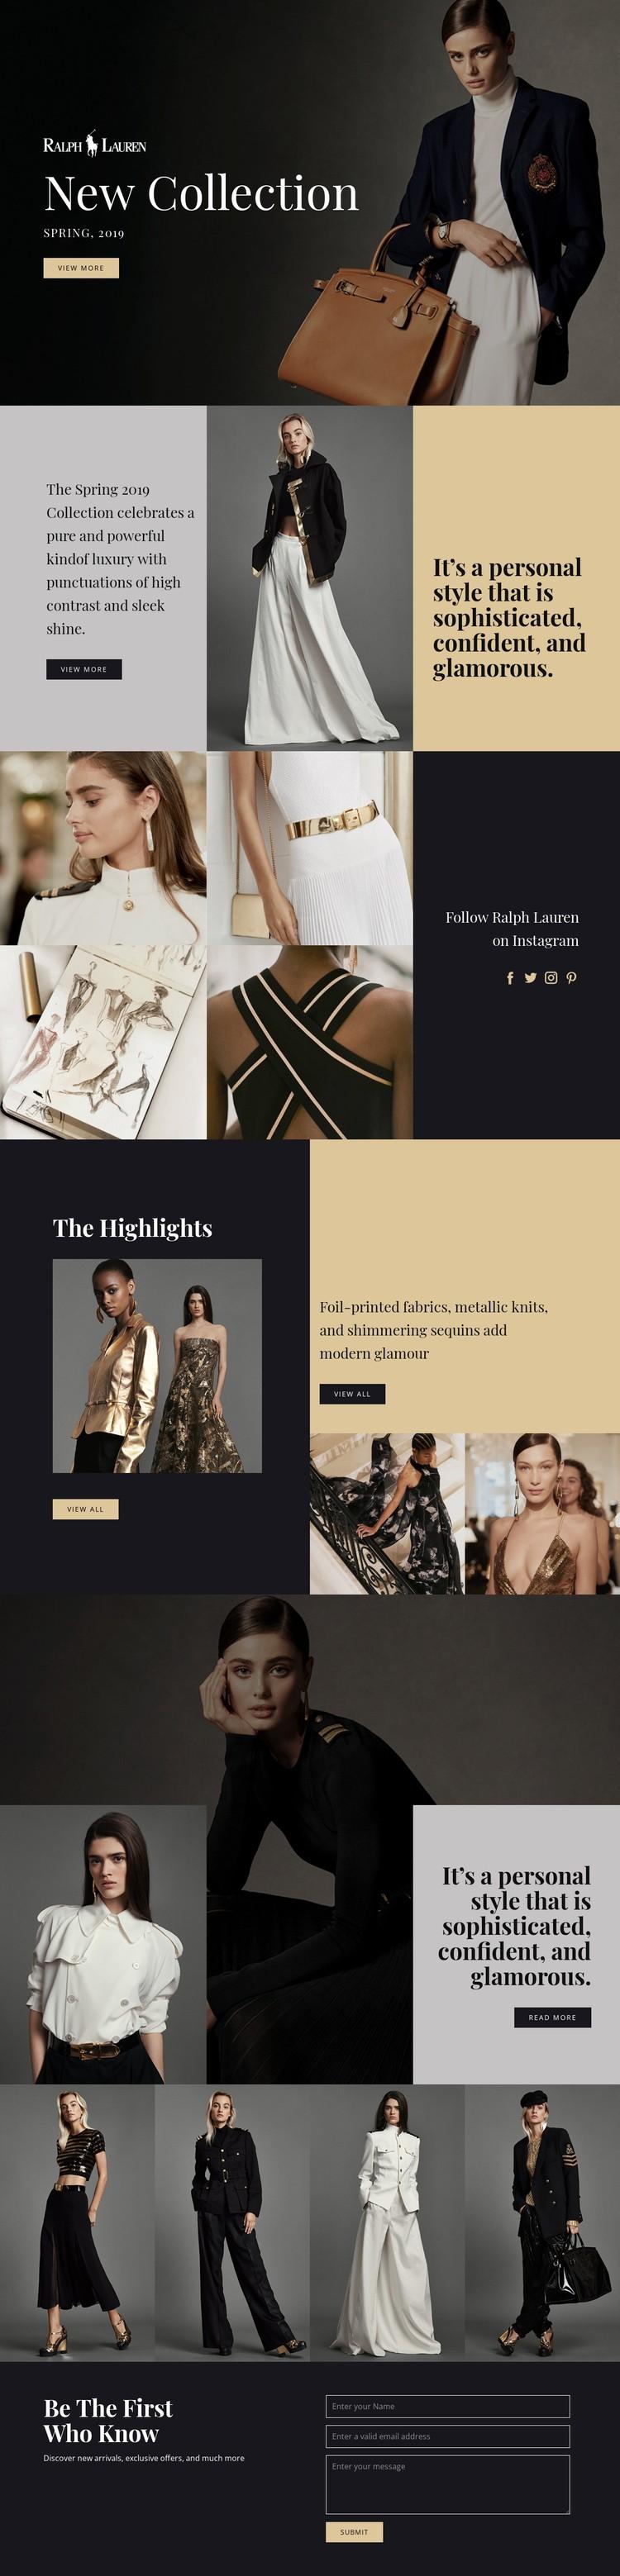 Ralph Lauren fashion Static Site Generator